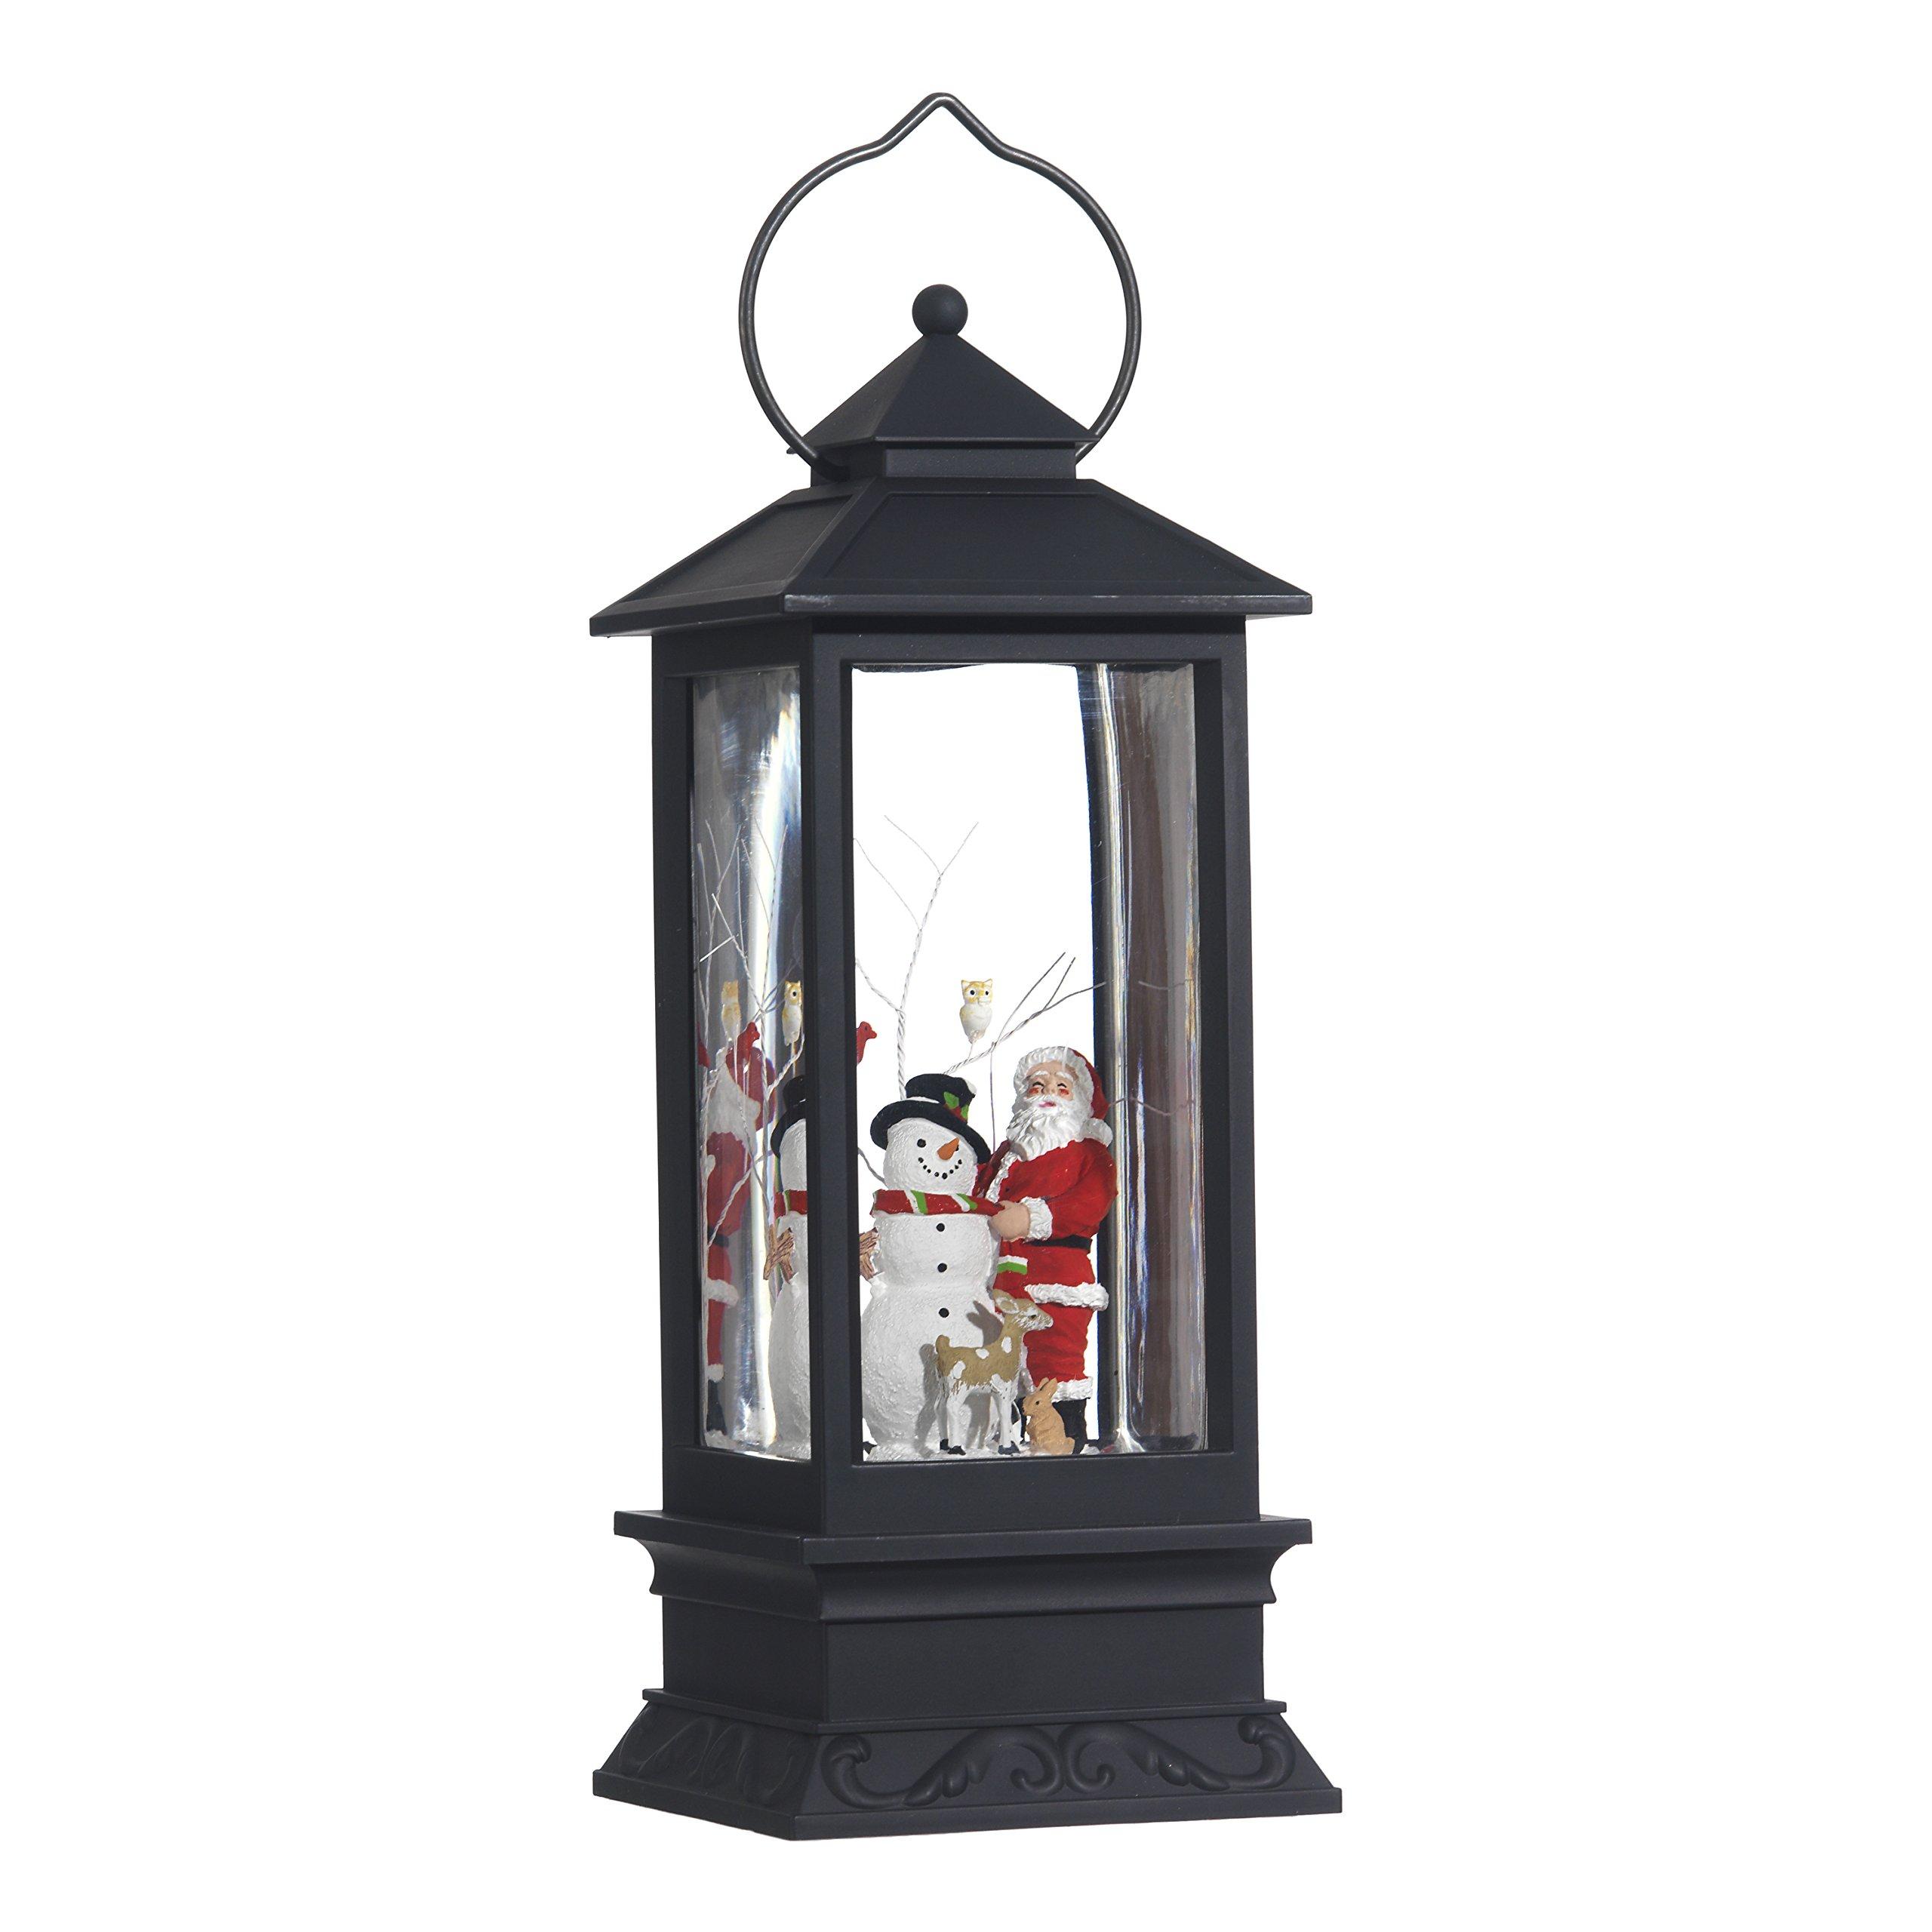 Lighted Snow Globe Lantern: 11 Inch, Black Holiday Water Lantern by RAZ Imports (Santa and Snowman)